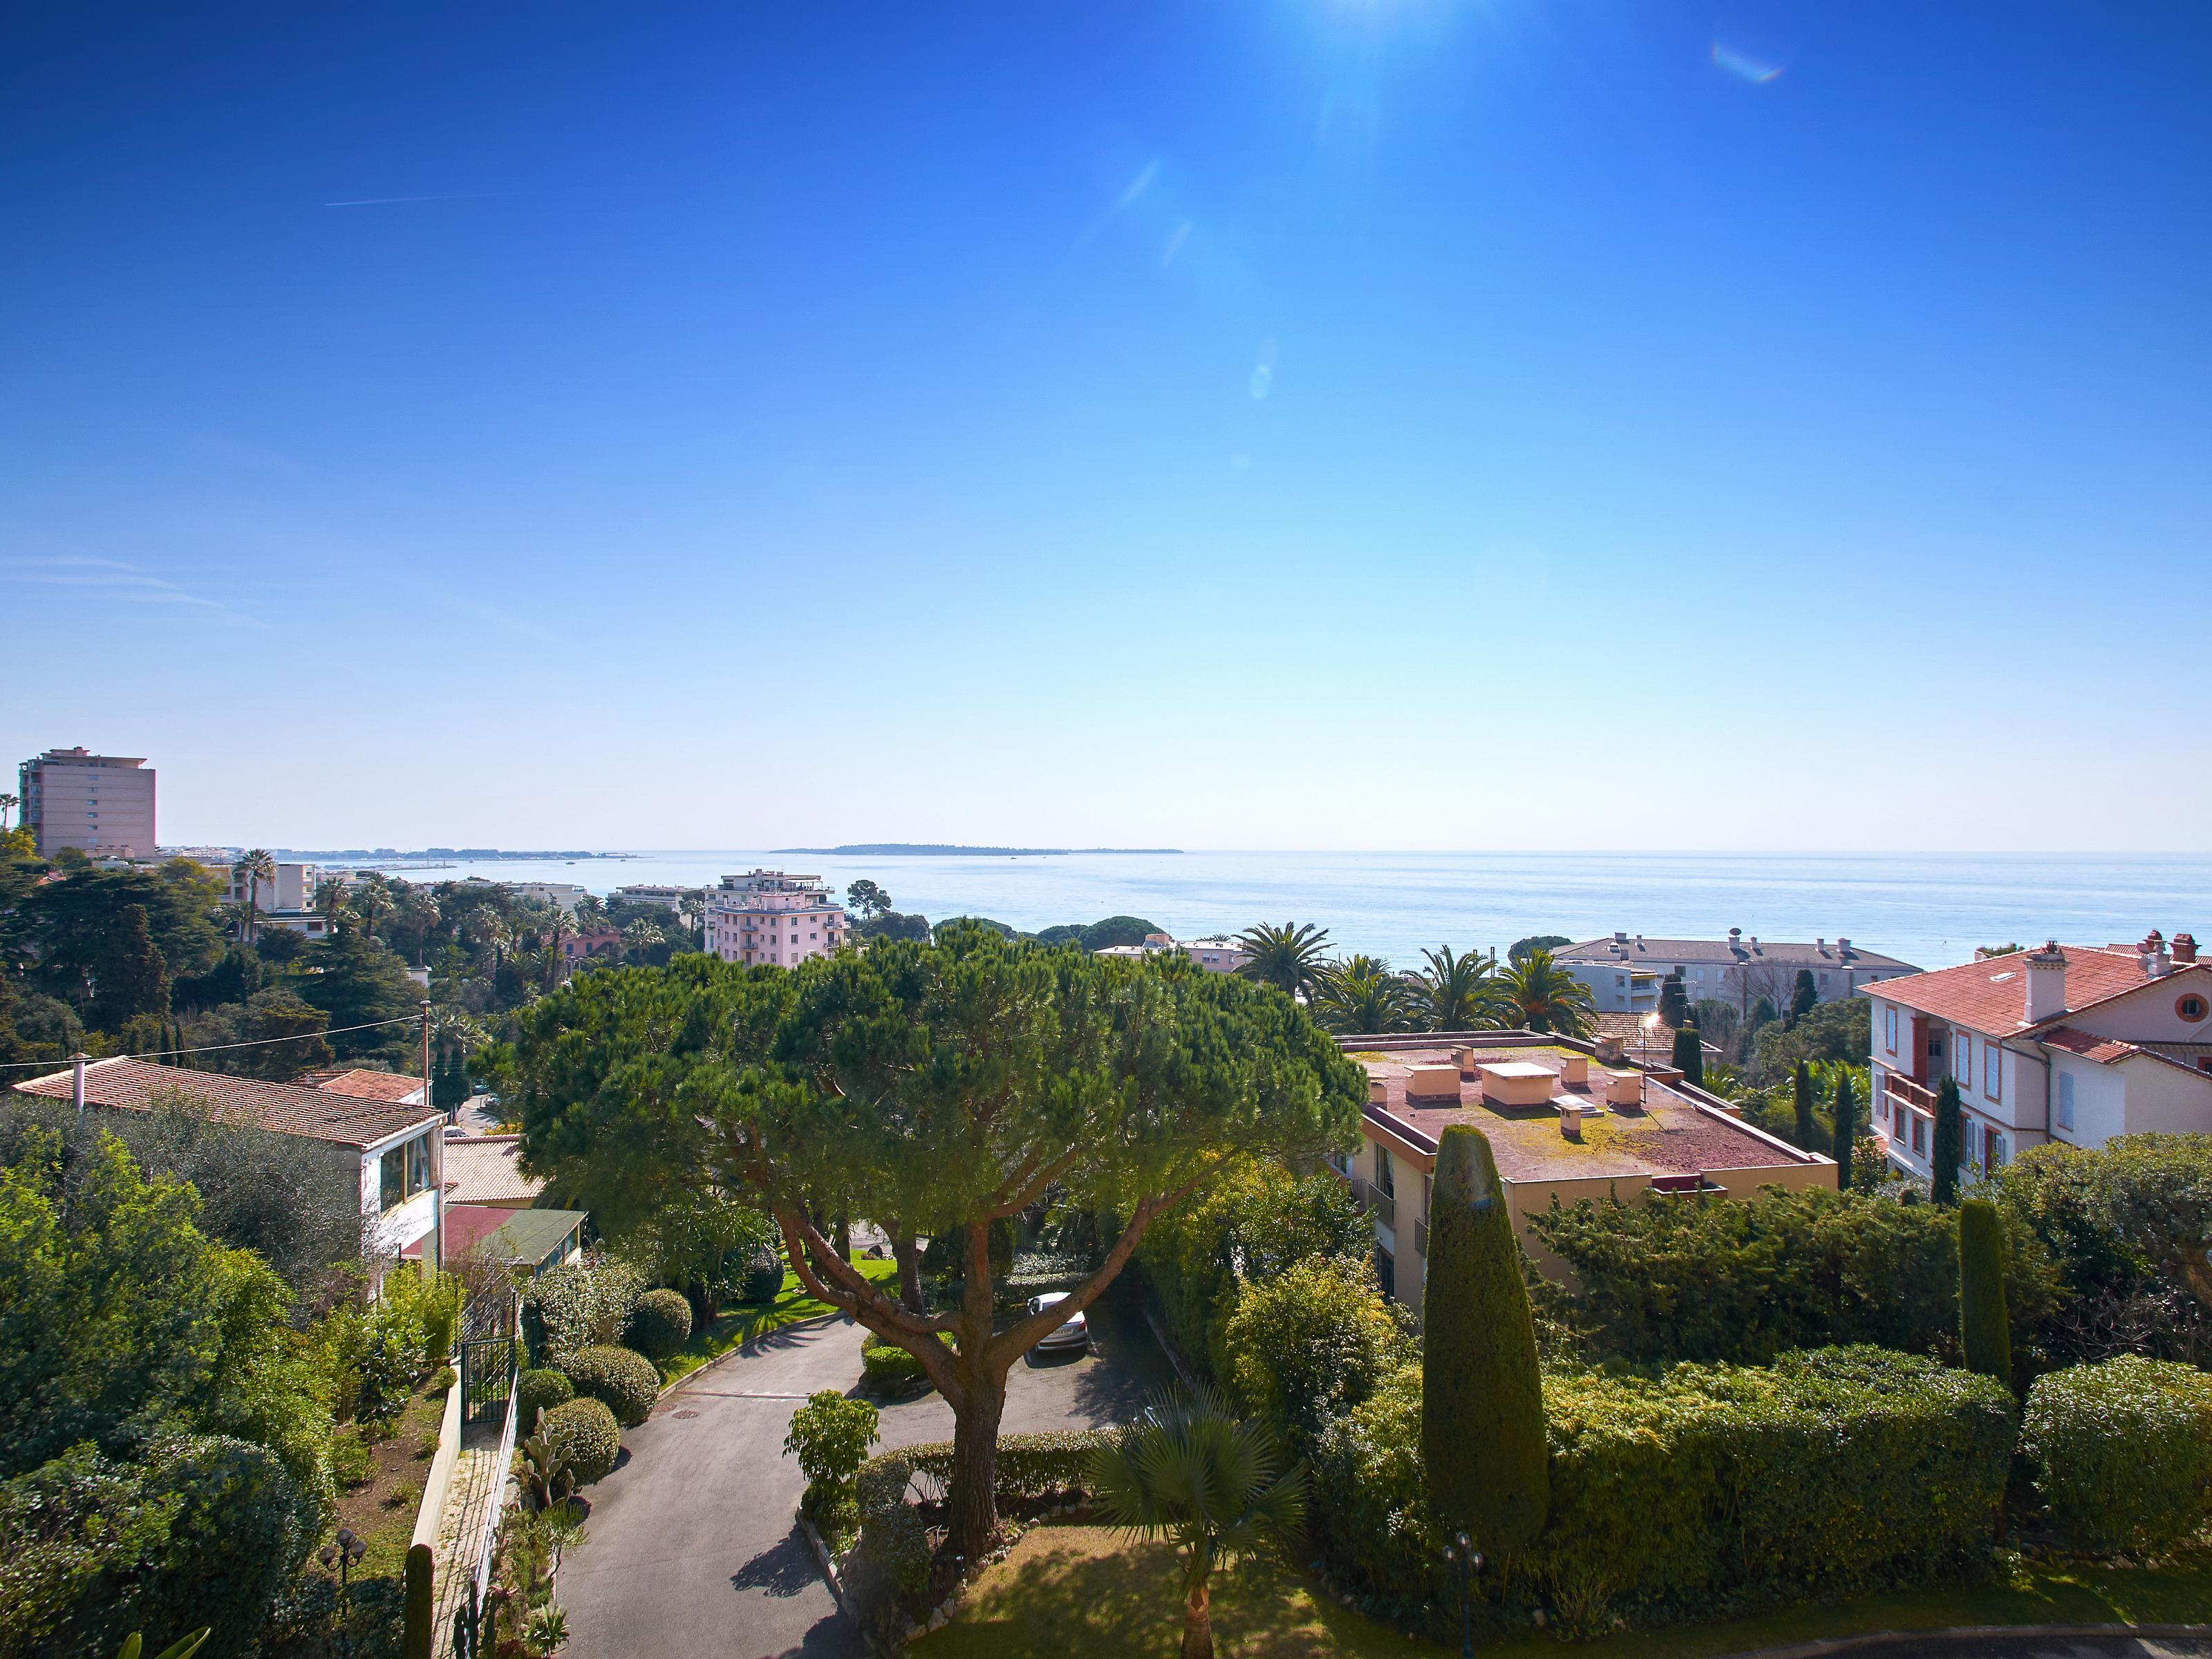 独户住宅 为 销售 在 Apartment for sale Cannes Cannes, 普罗旺斯阿尔卑斯蓝色海岸 06150 法国